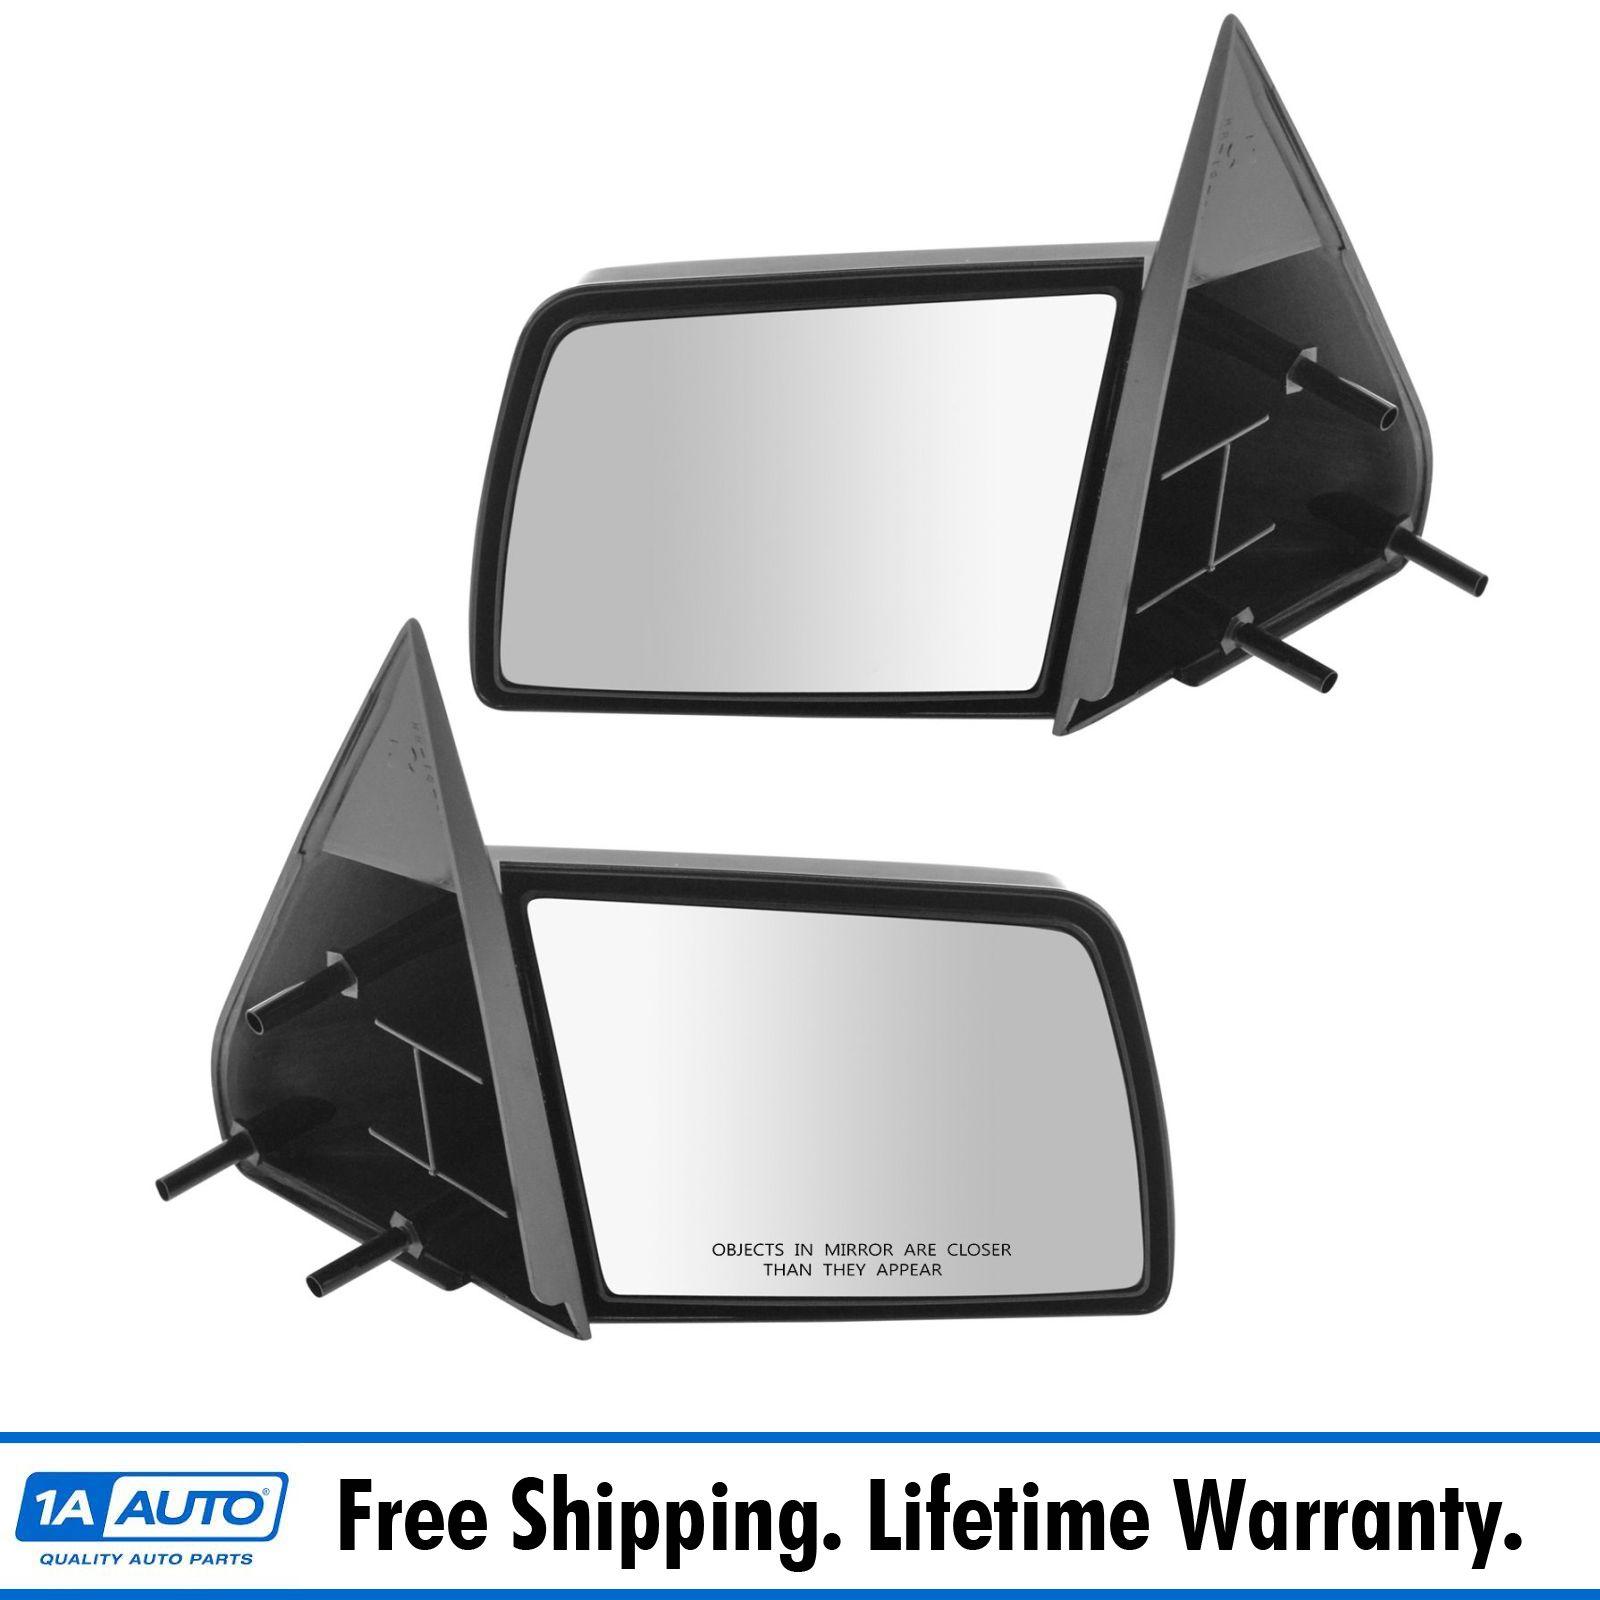 OEM Exterior Mirror Motor Pair LH Driver /& RH Passenger Sides for Chevy GMC New